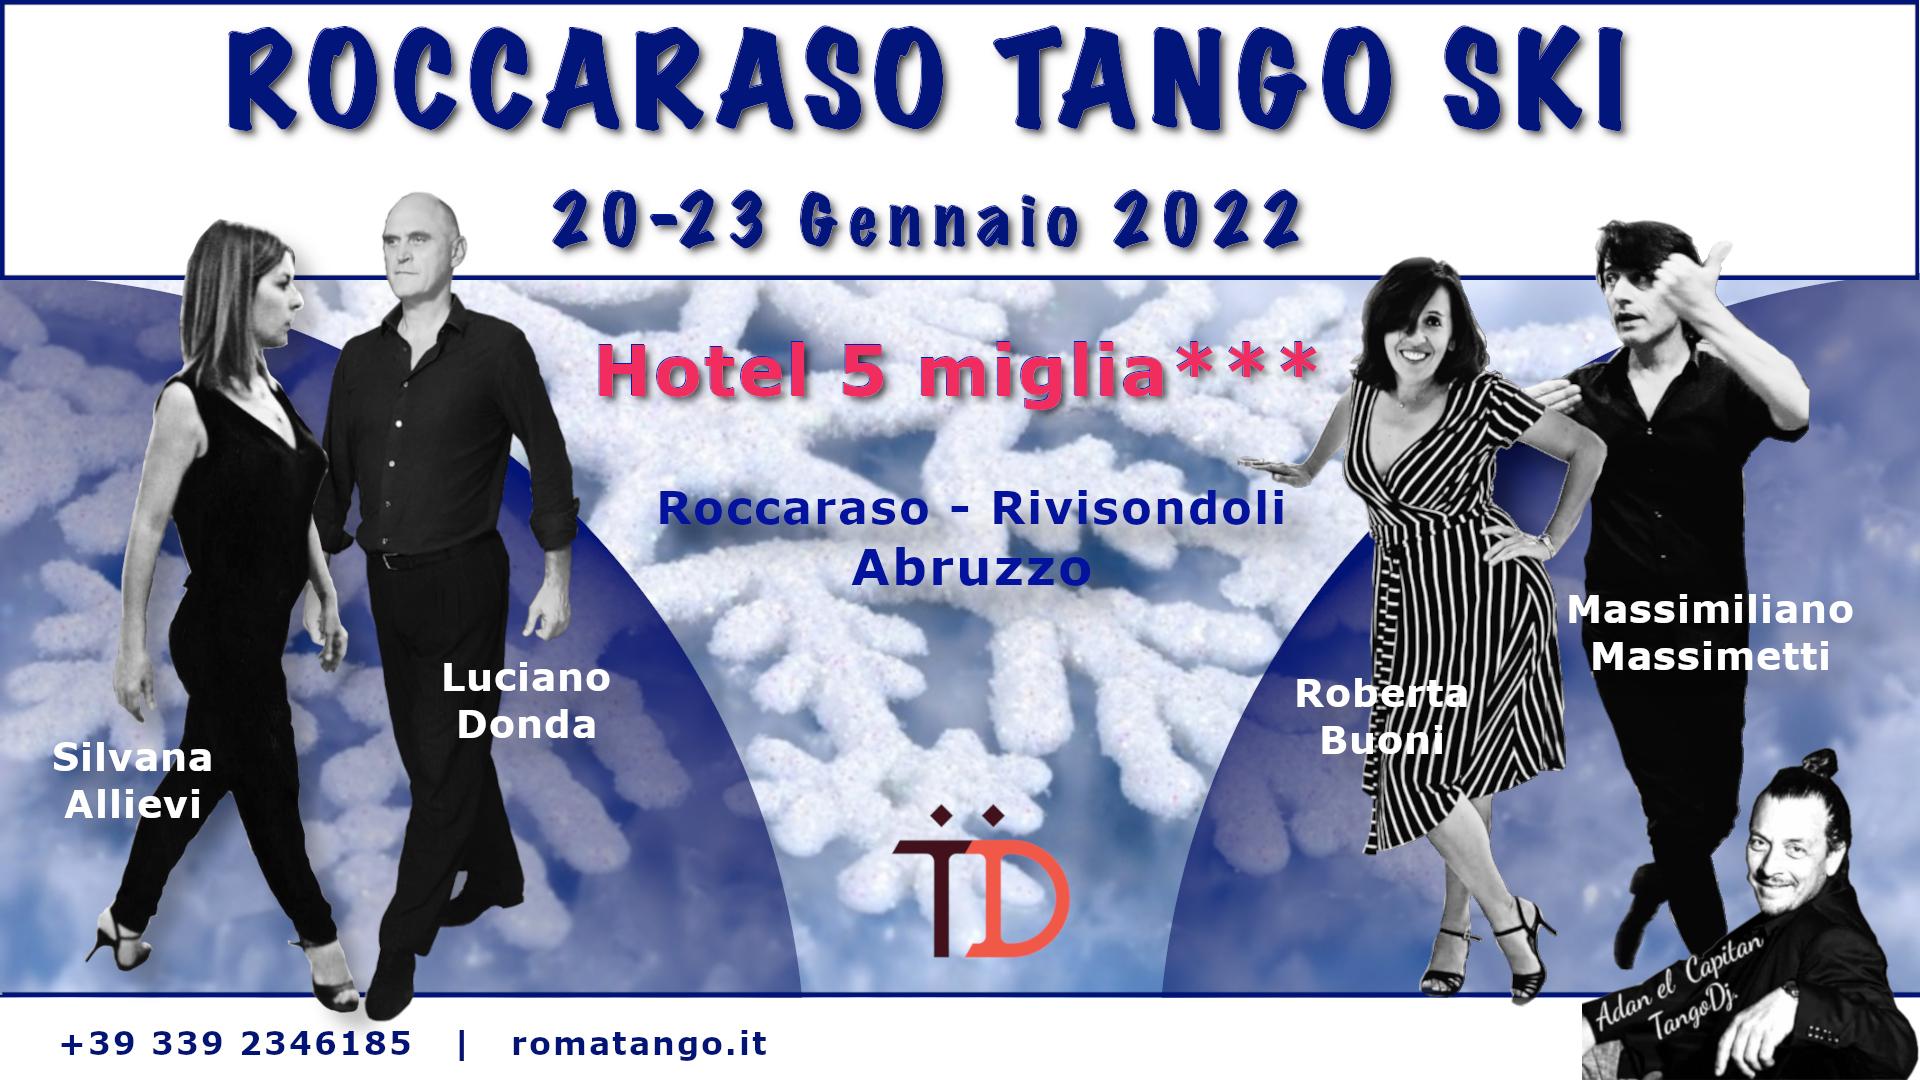 Roccaraso Tango Ski 2022